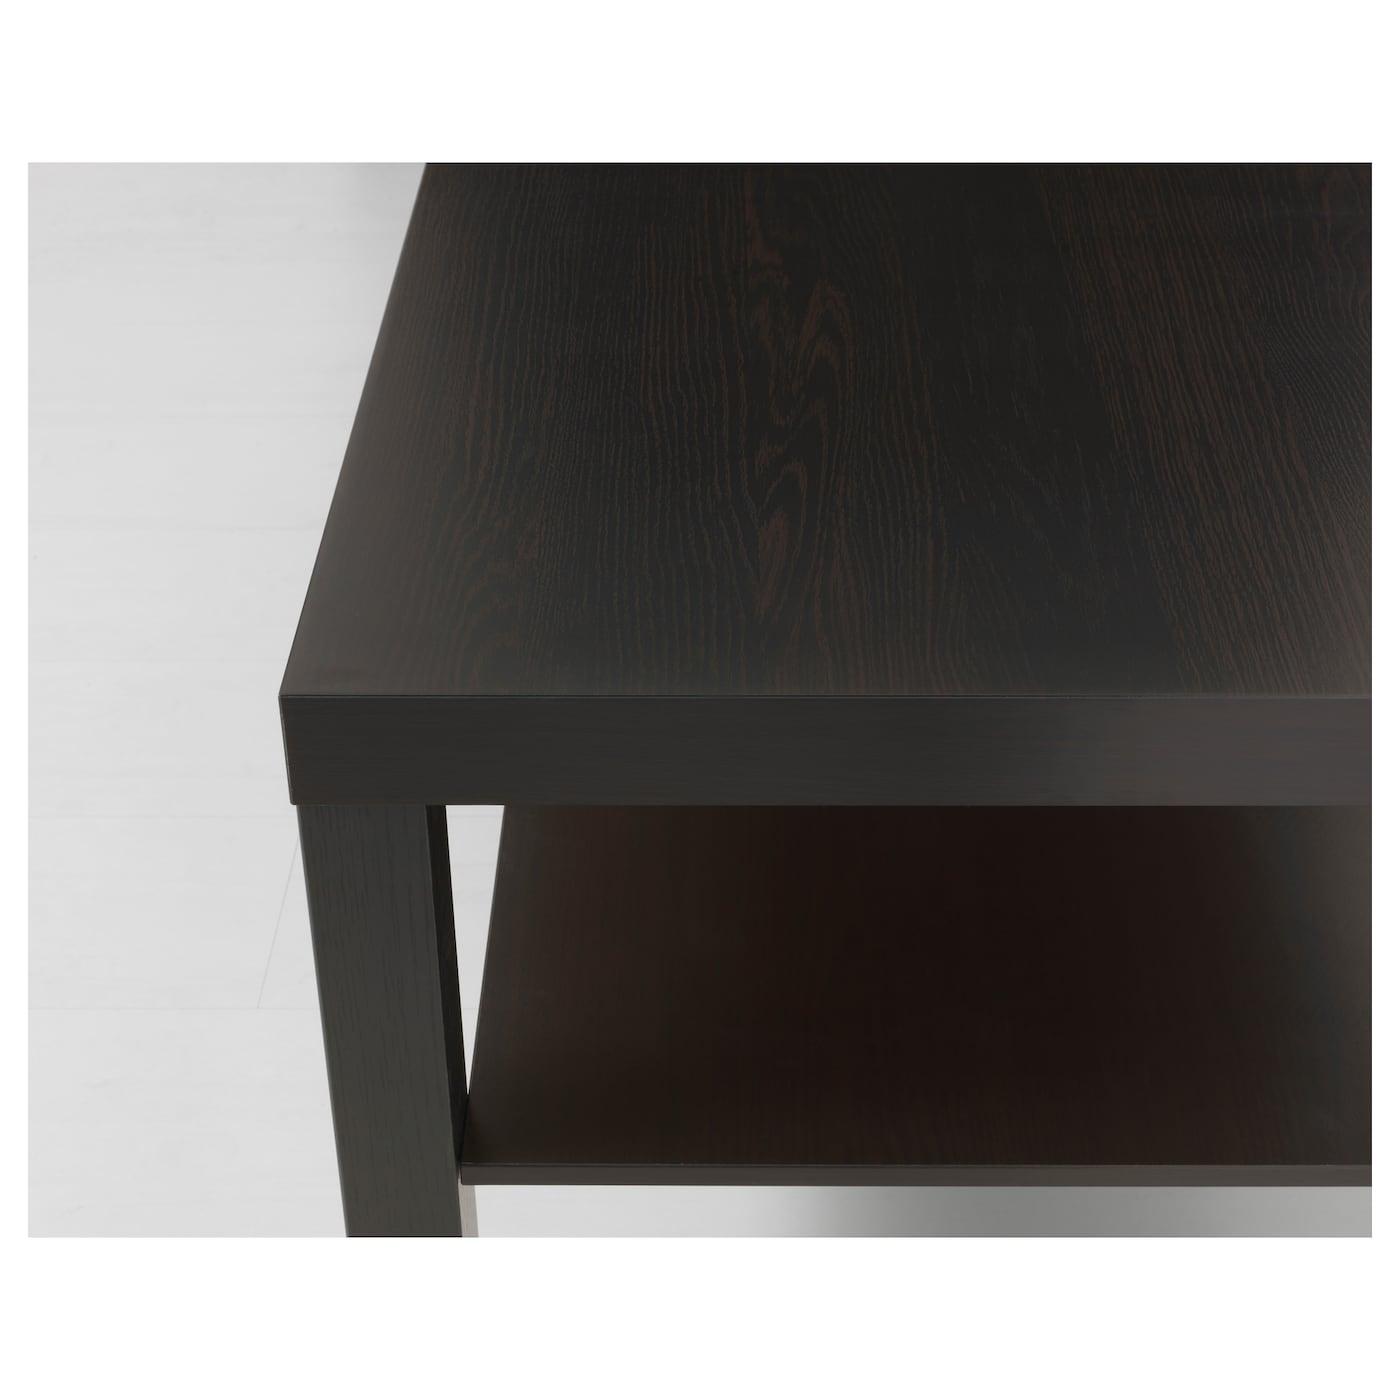 Hemnes Coffee Table Black Brown 90 X 90 Cm: LACK Coffee Table Black-brown 90 X 55 Cm